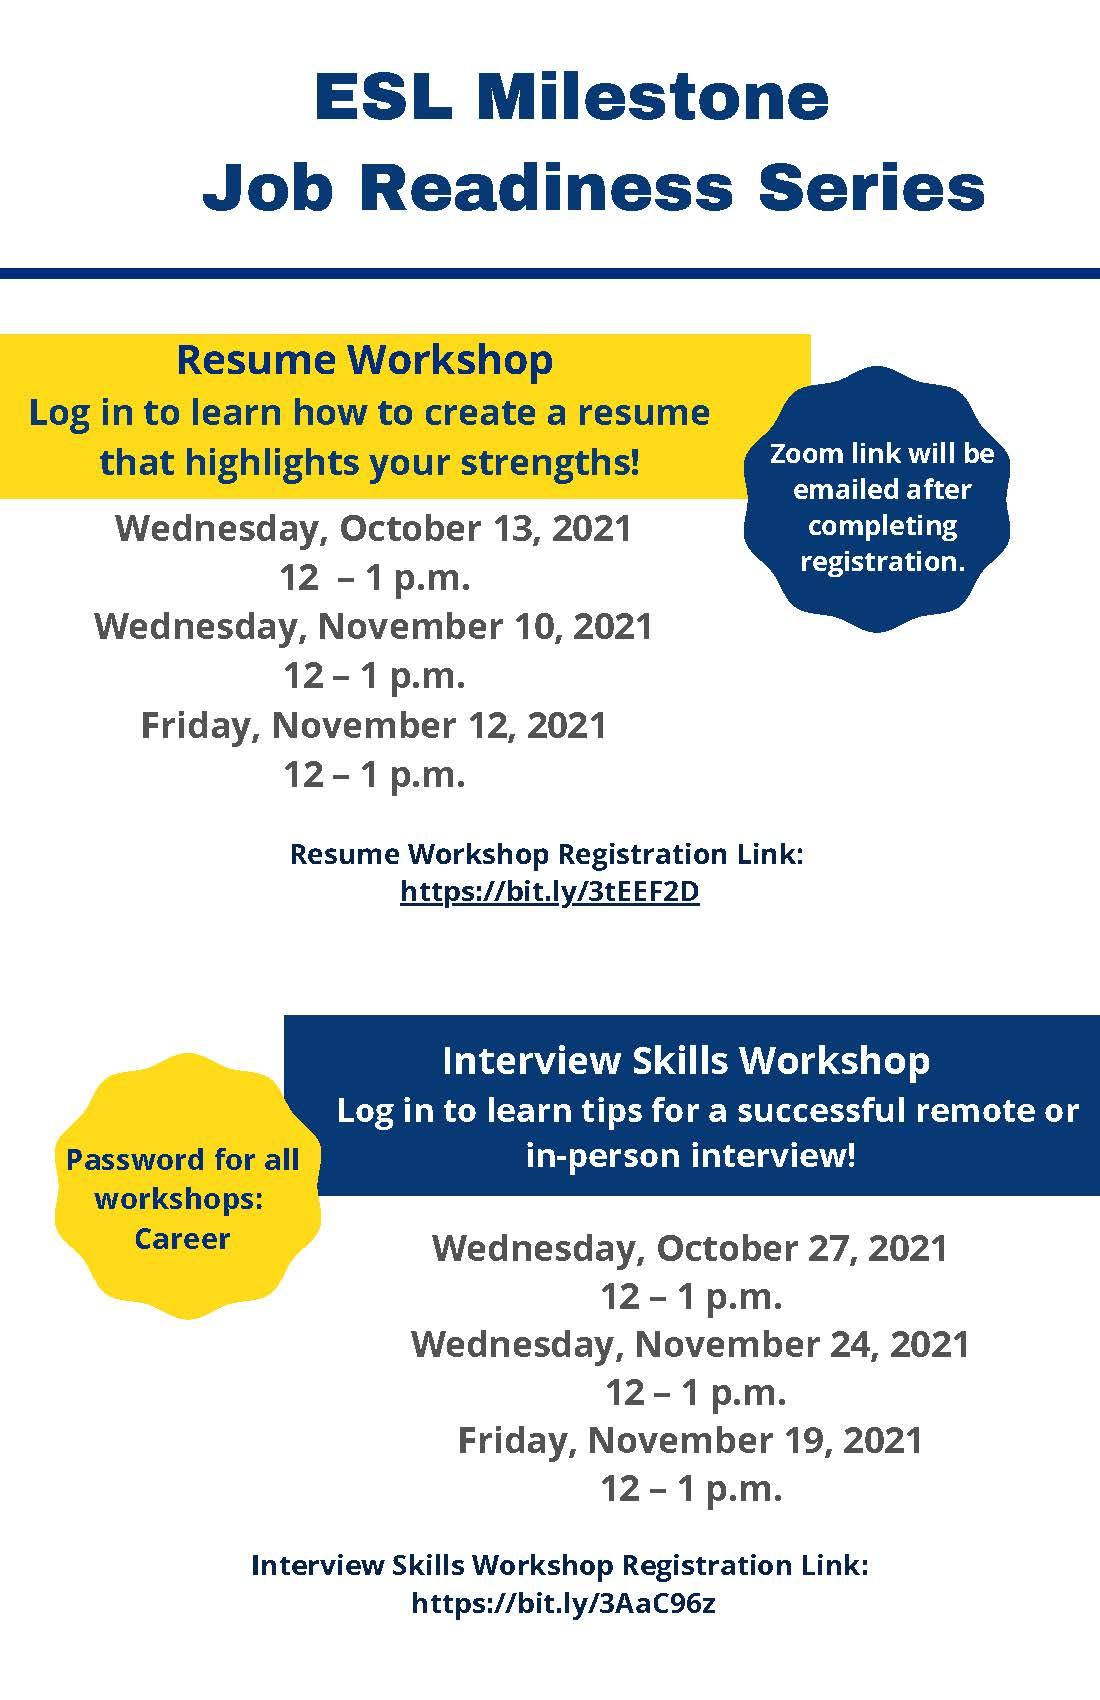 ESL Milestone Job Readiness Series flyer